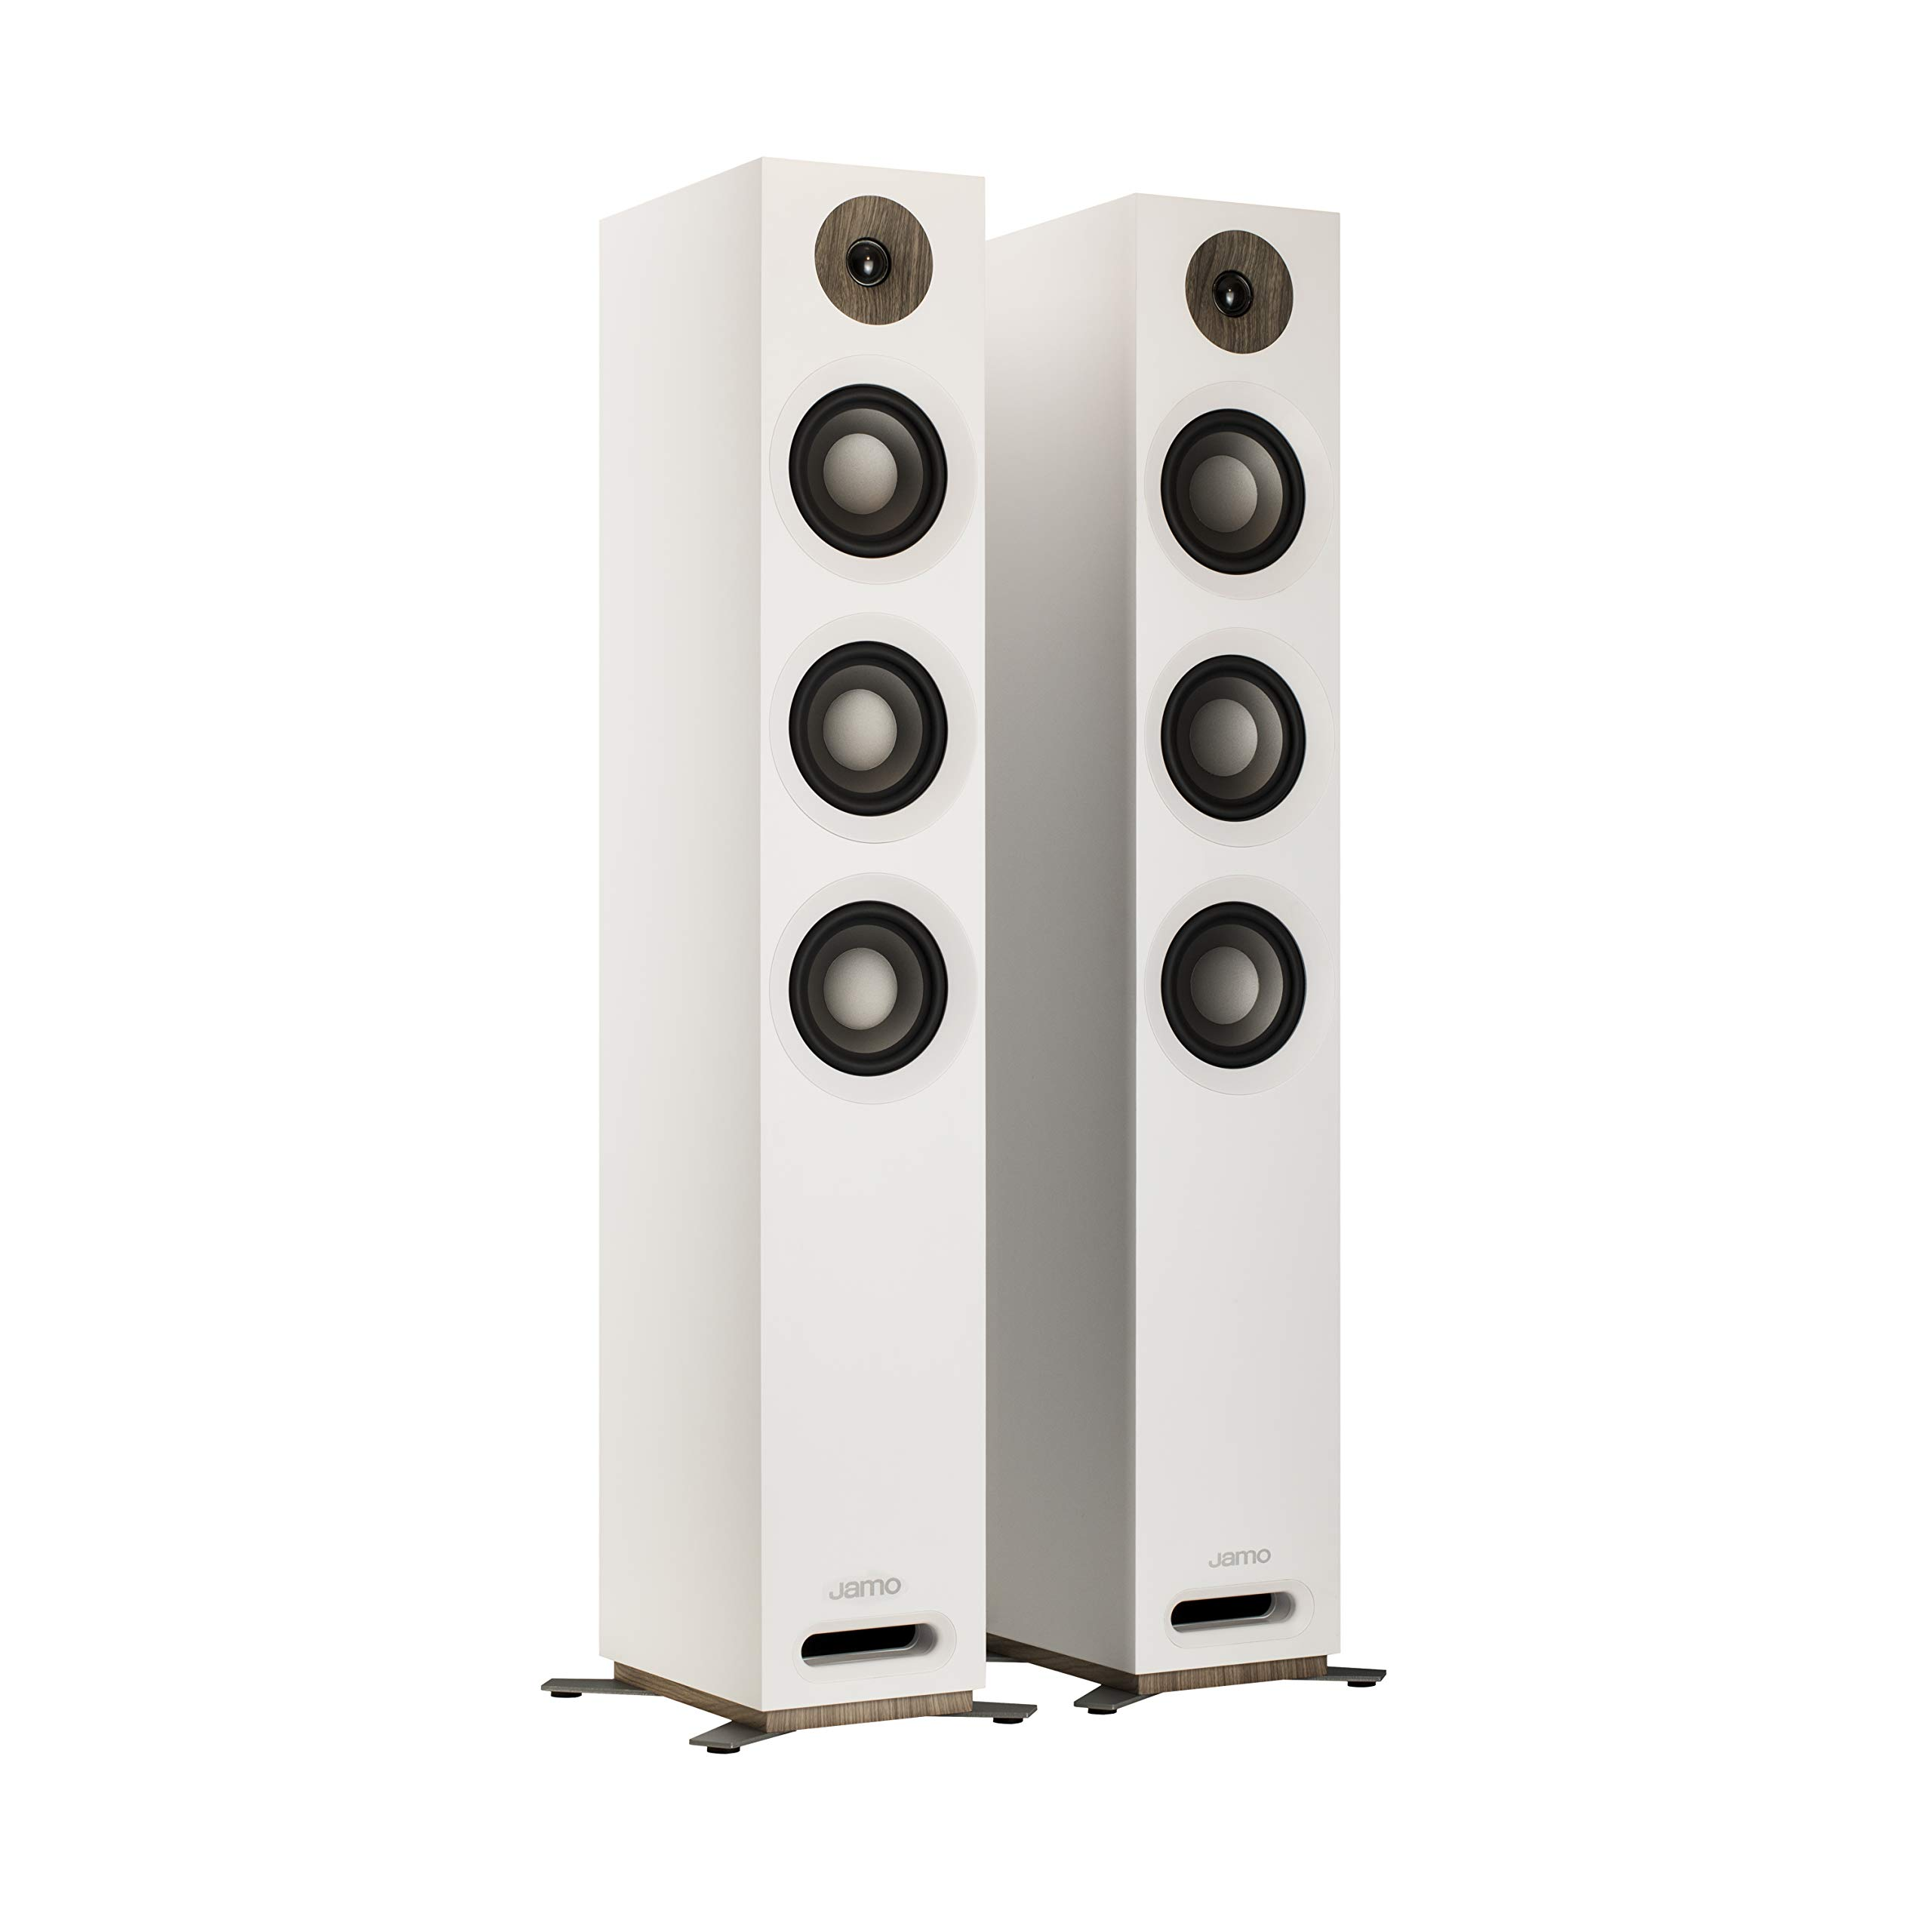 Jamo Studio Series S809 Floorstanding Speaker Pair (White)